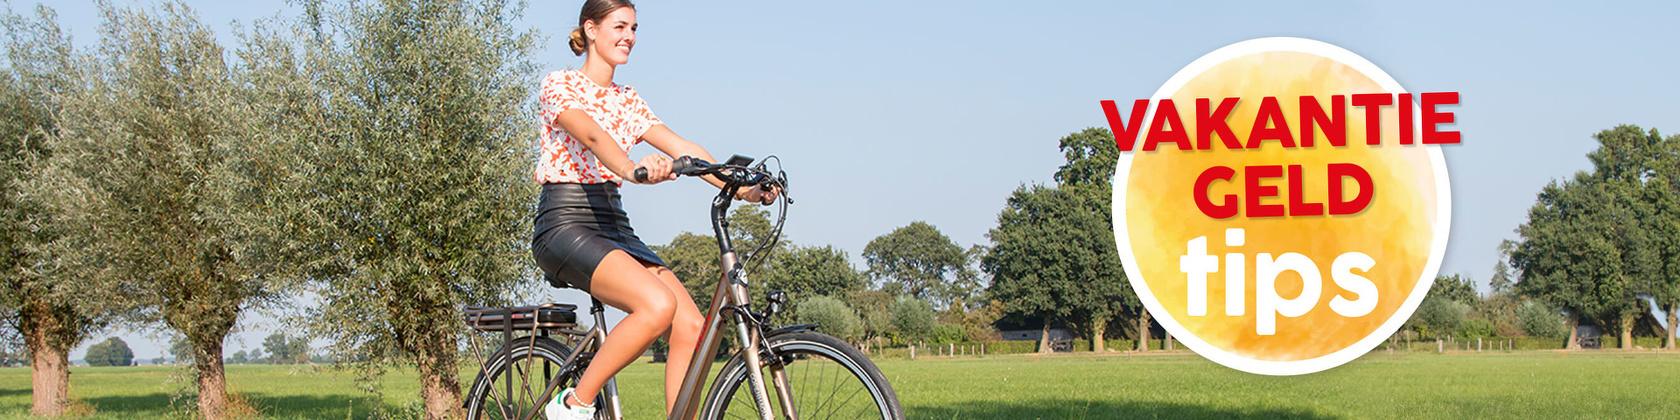 VAKANTIEGELD TIP - Schaf een Stella E-bike aan!